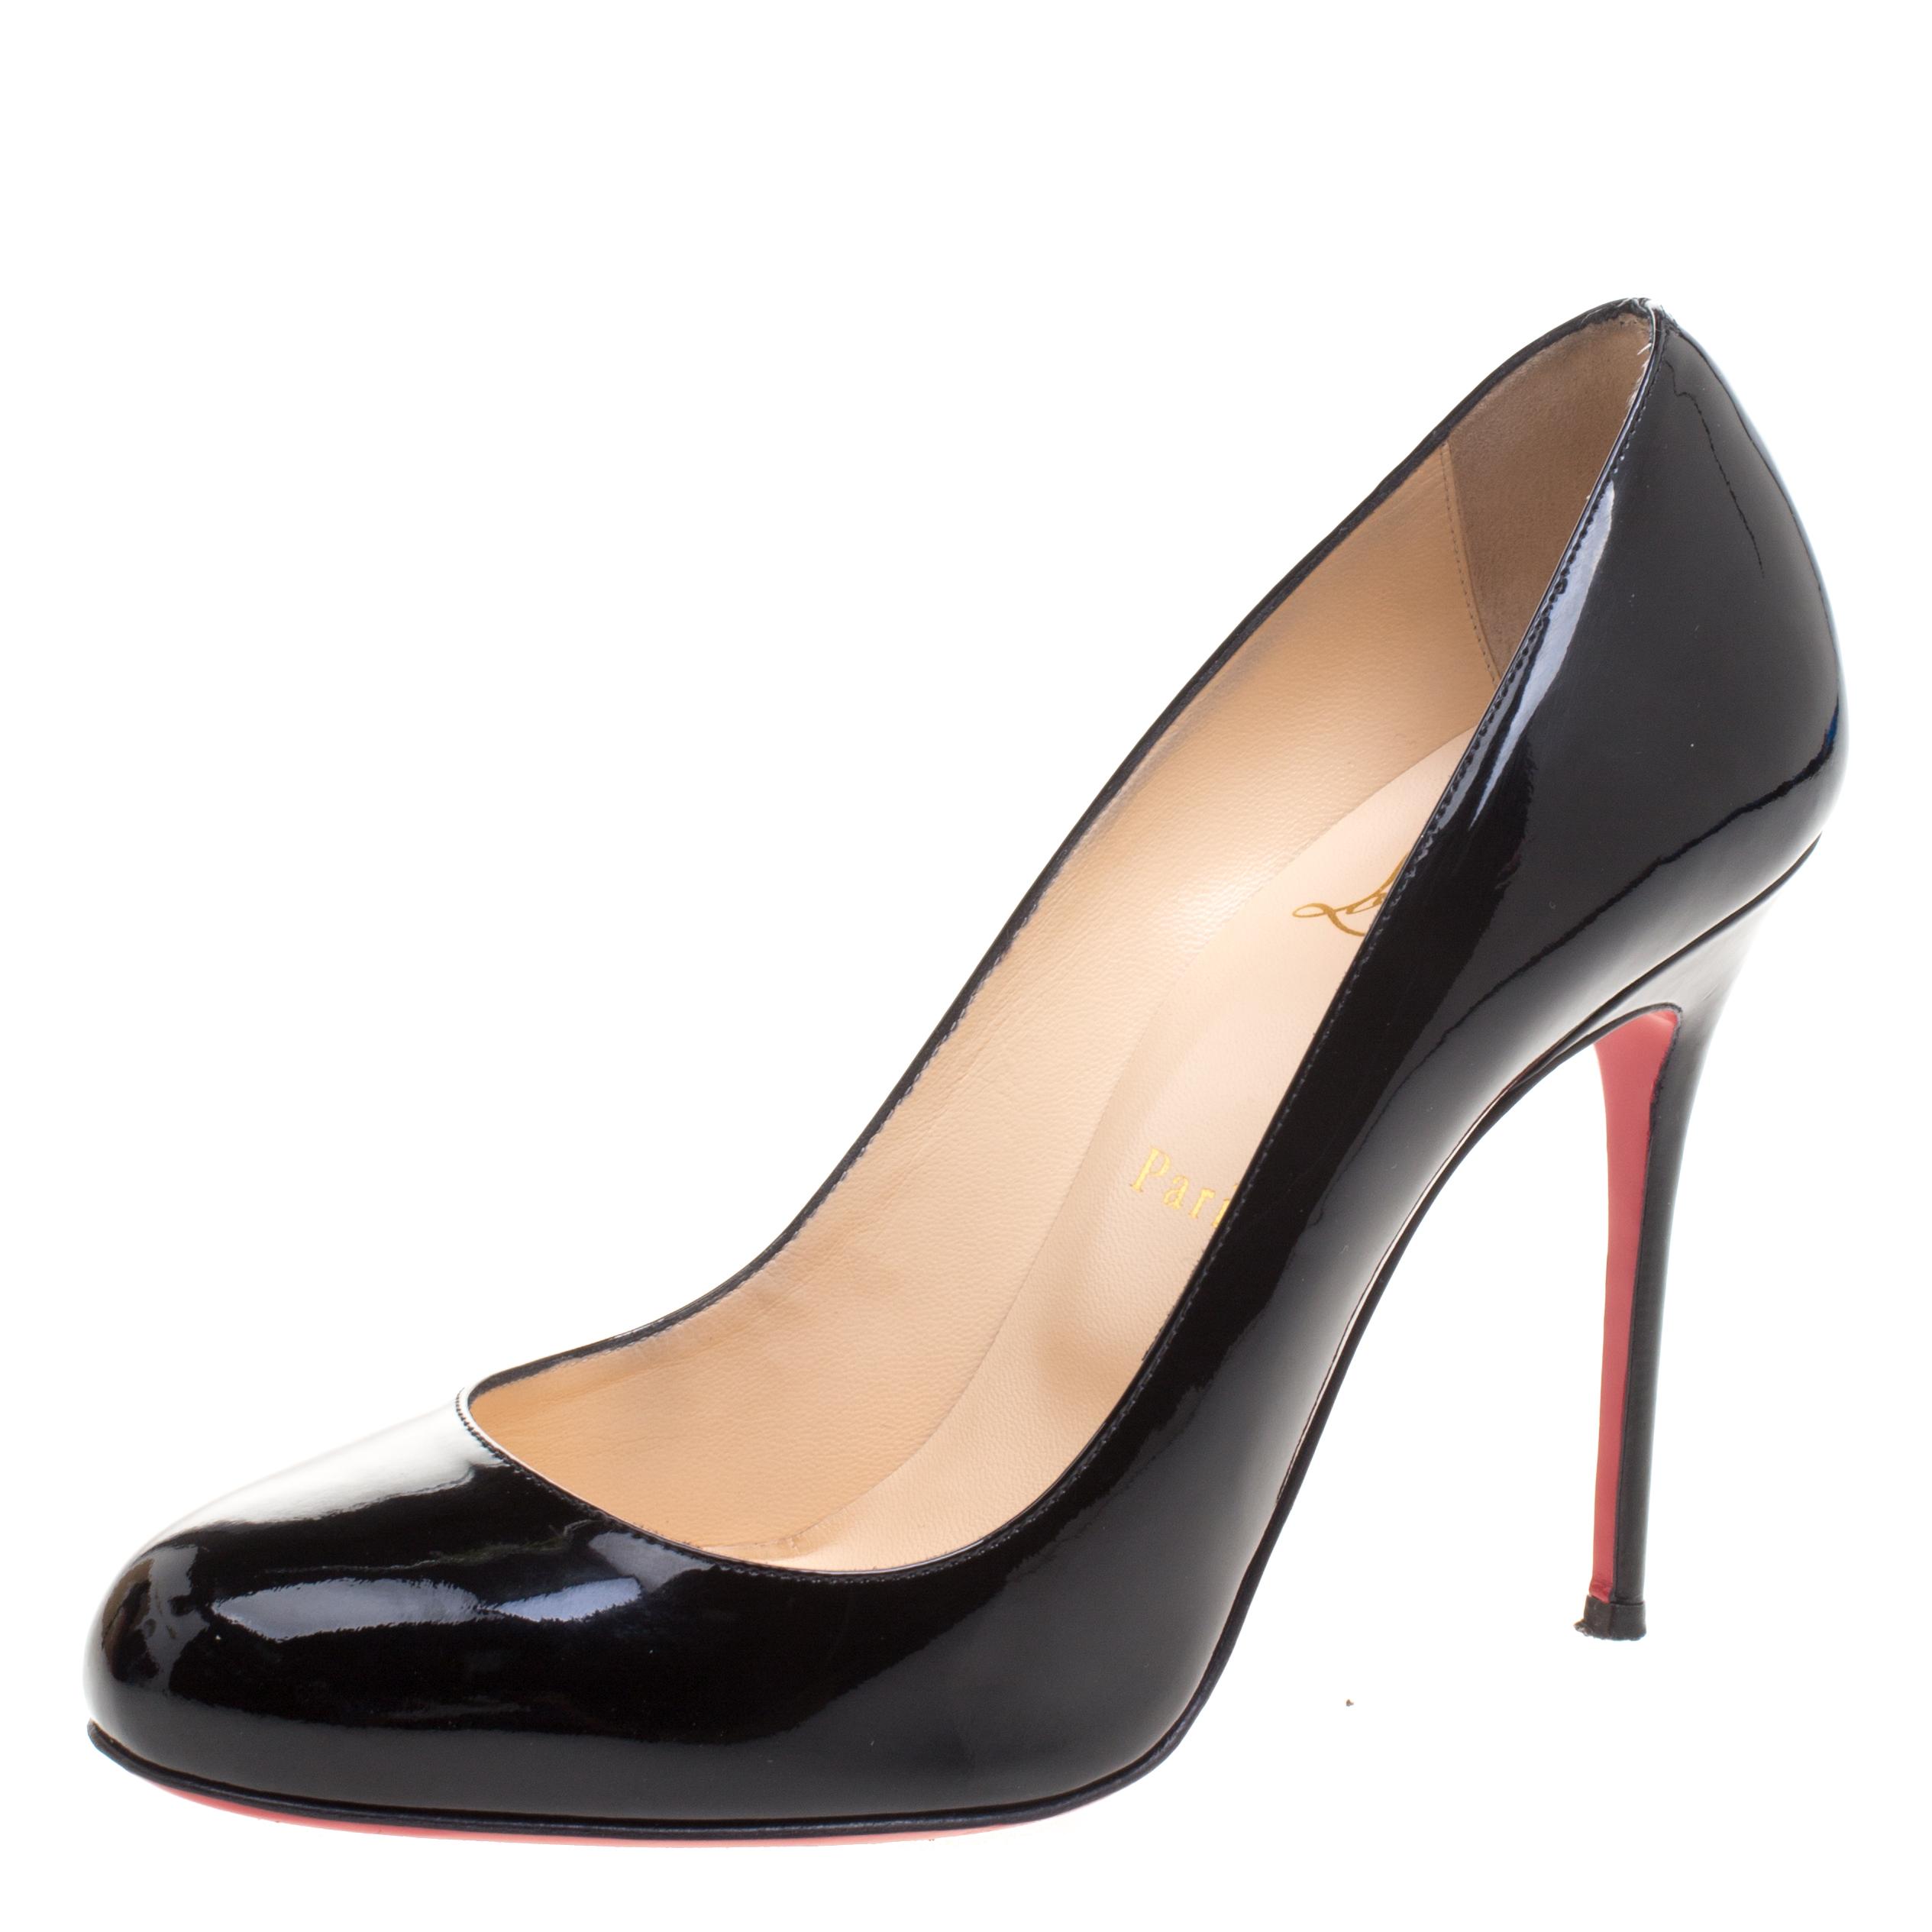 7d1da6e75b3 Buy Christian Louboutin Black Patent Leather Fifi Pumps Size 39.5 ...